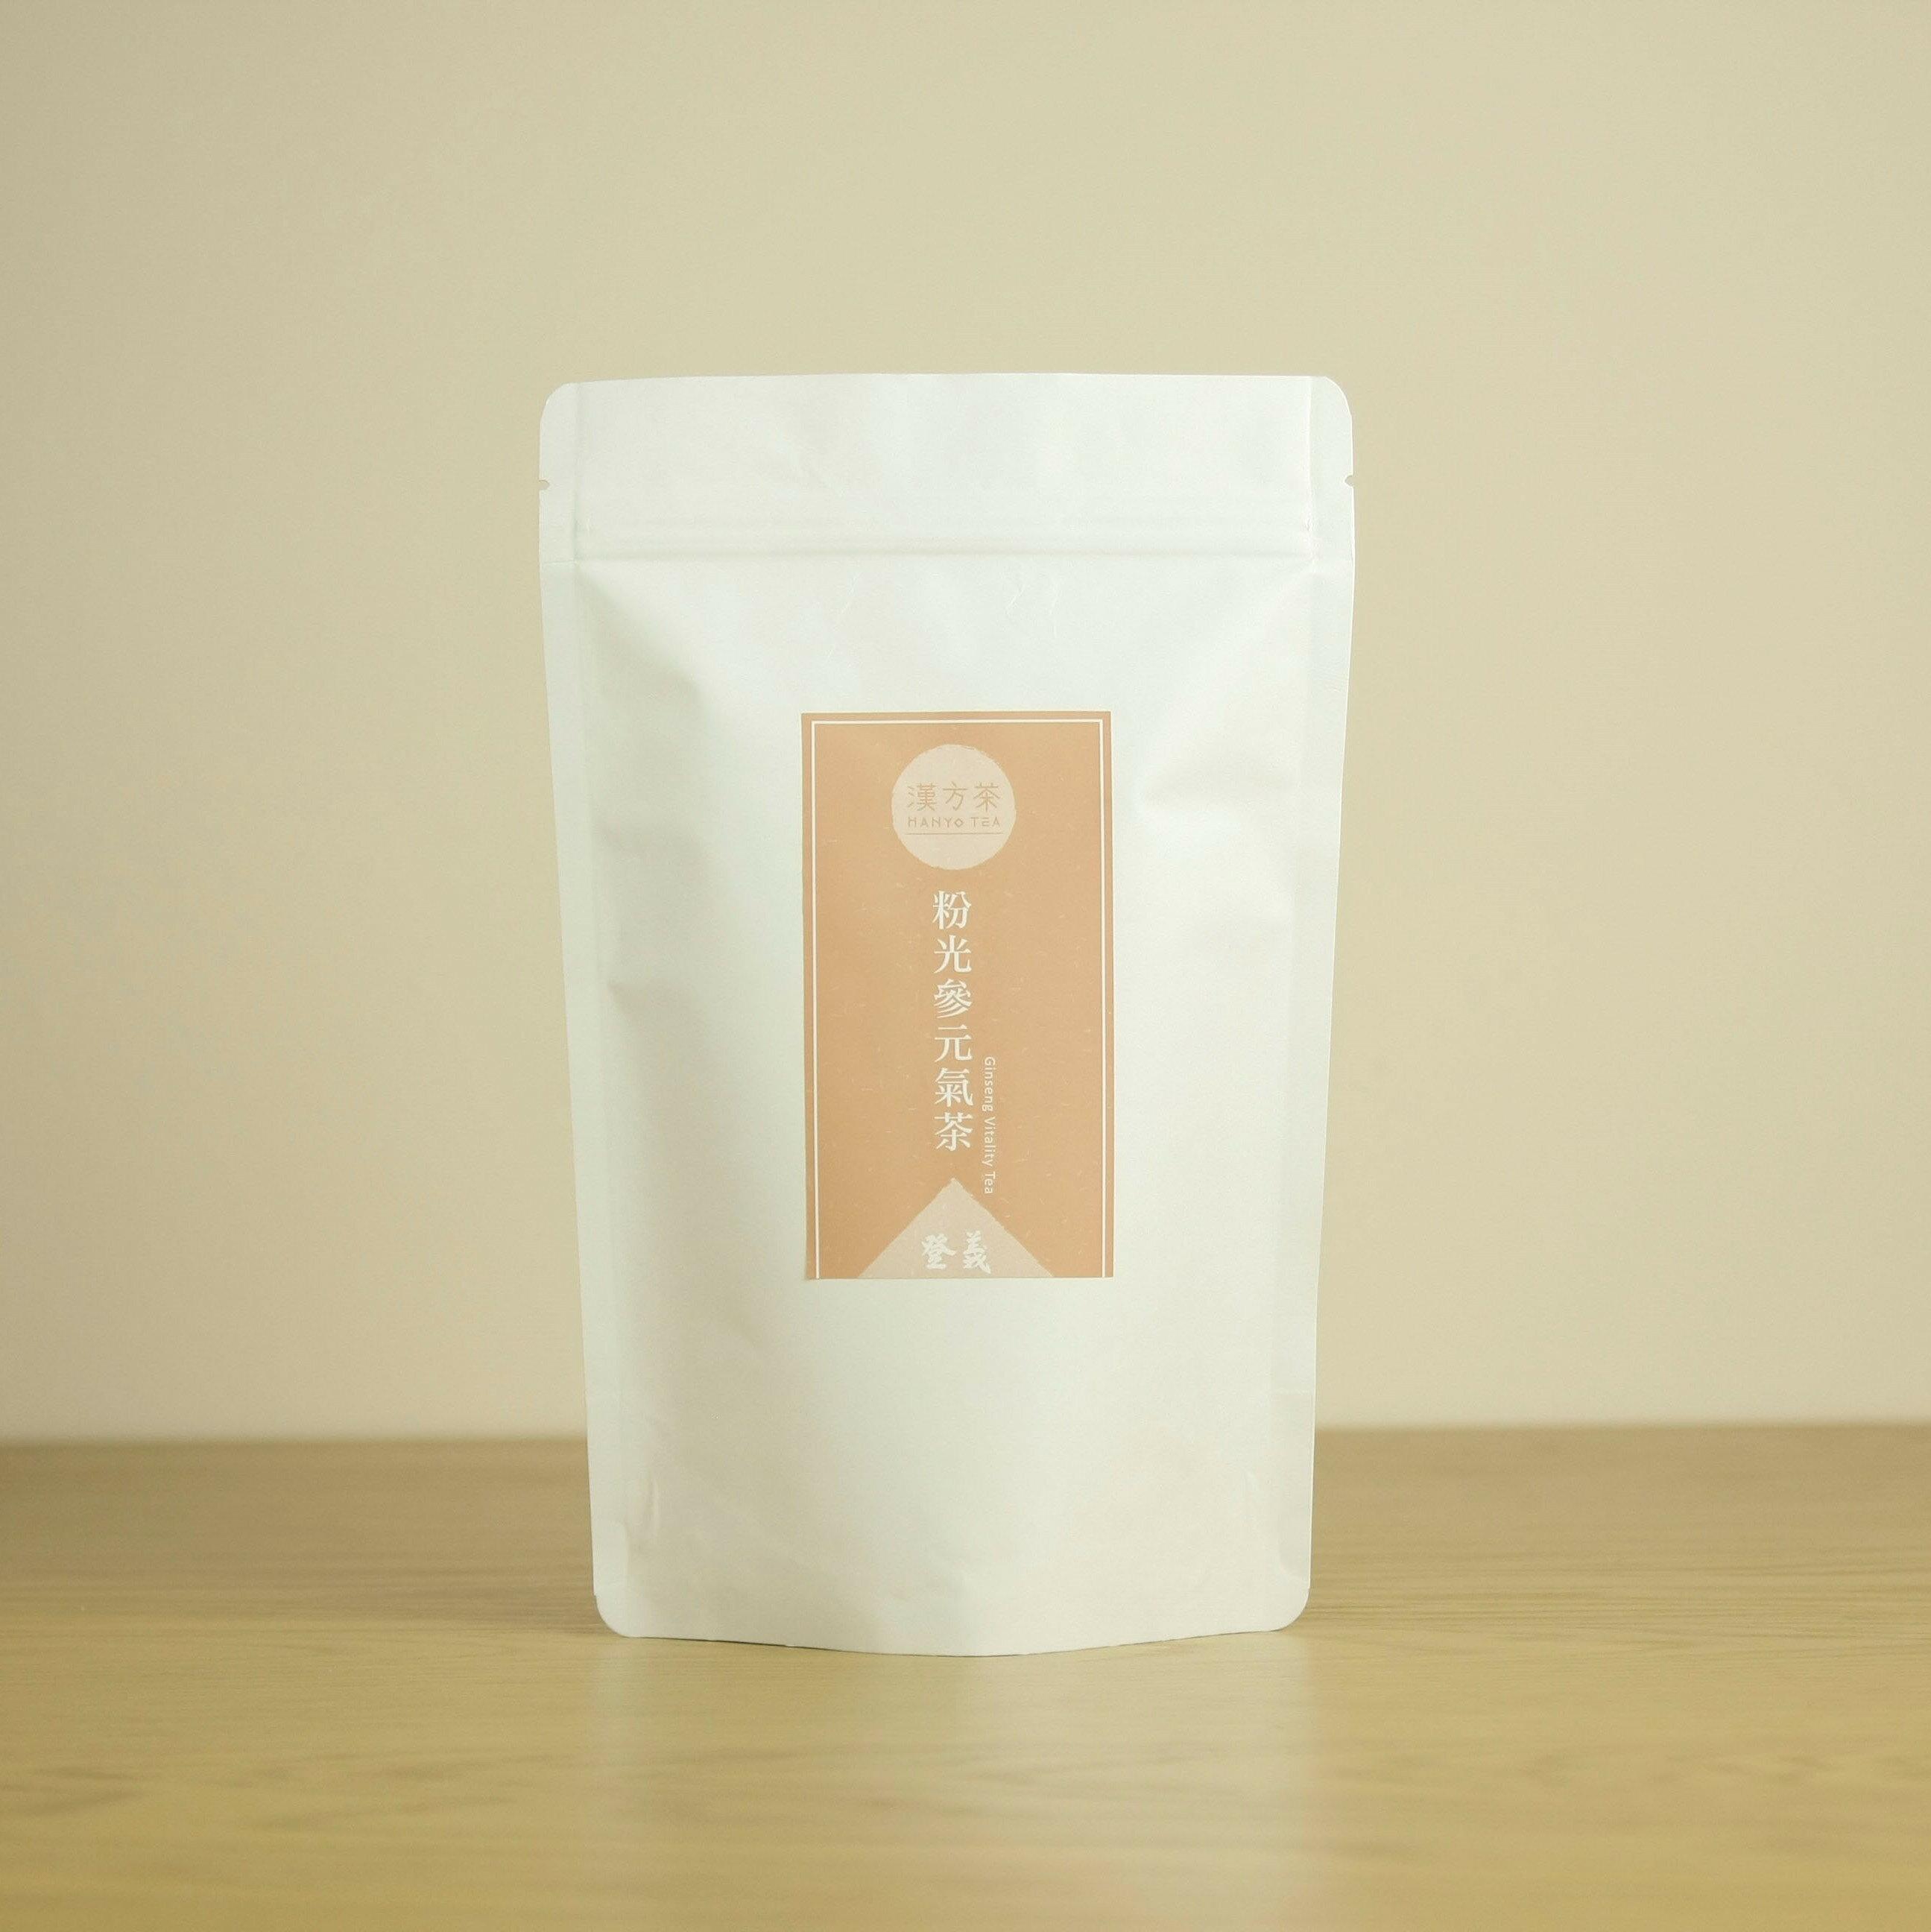 <br/><br/>  【登義漢方】漢方茶HanYo tea-粉光參元氣茶(20入)<br/><br/>